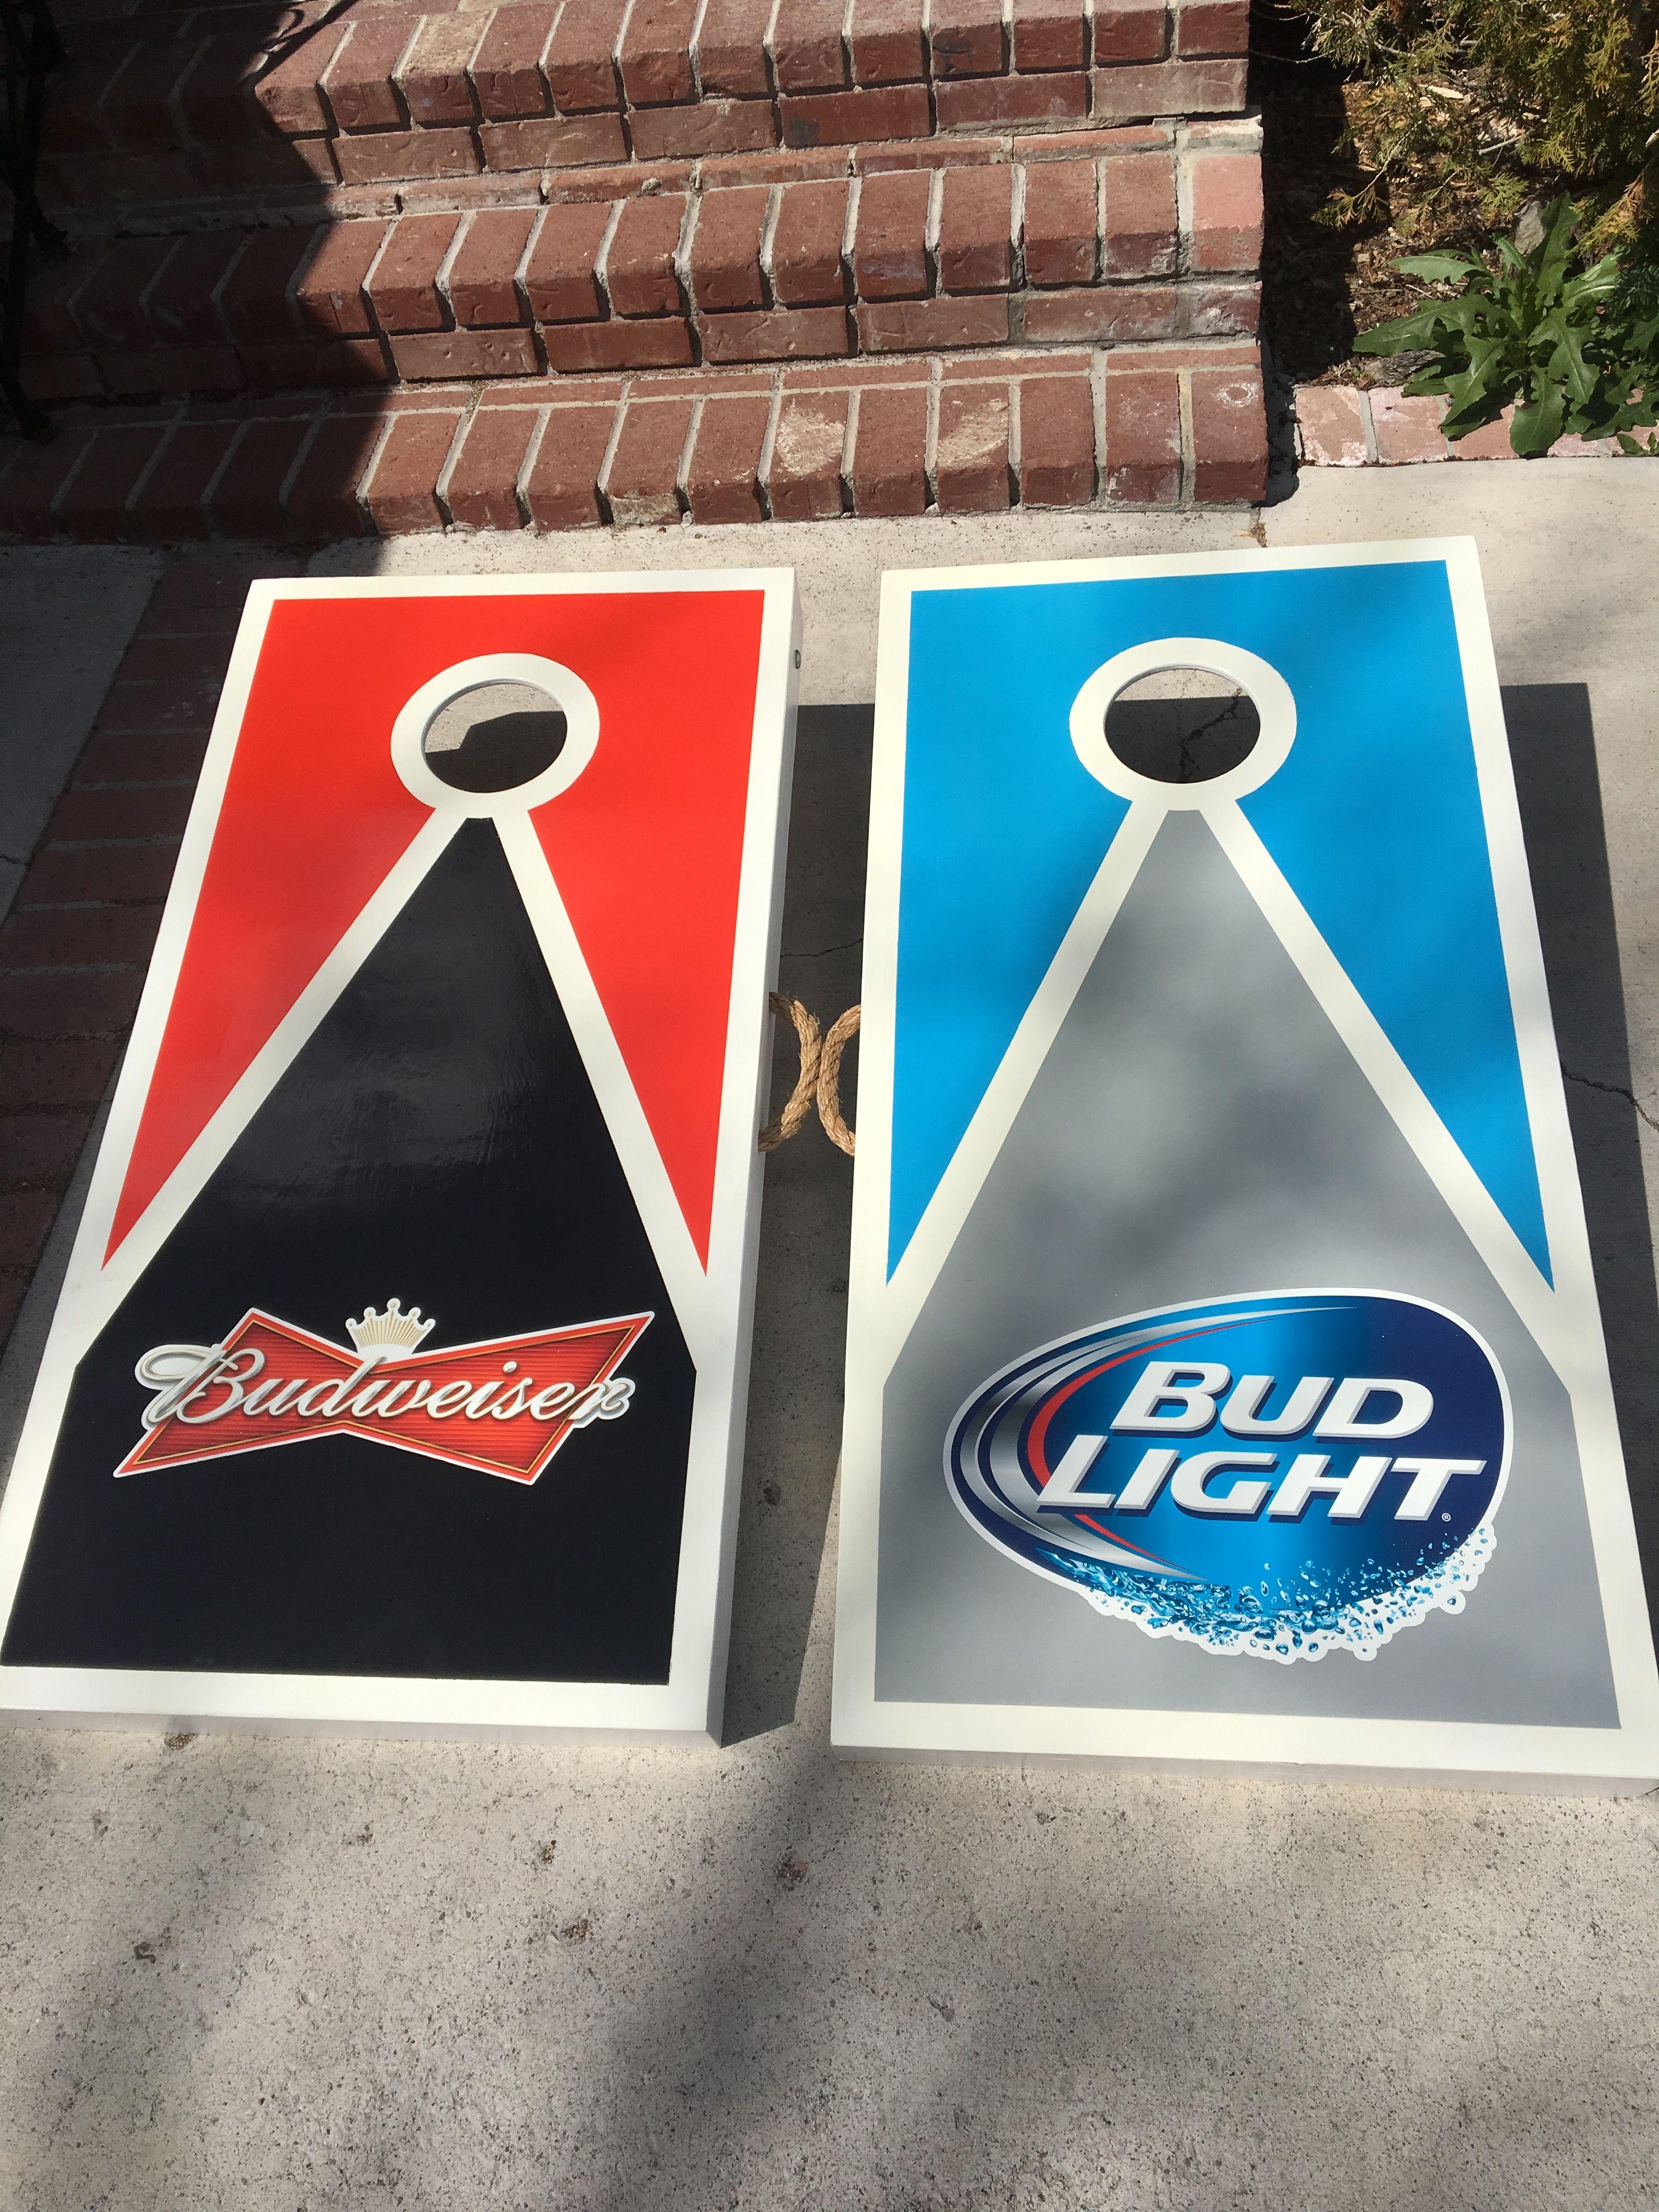 Bud Light and Budweiser cornhole boards. Cornhole boards